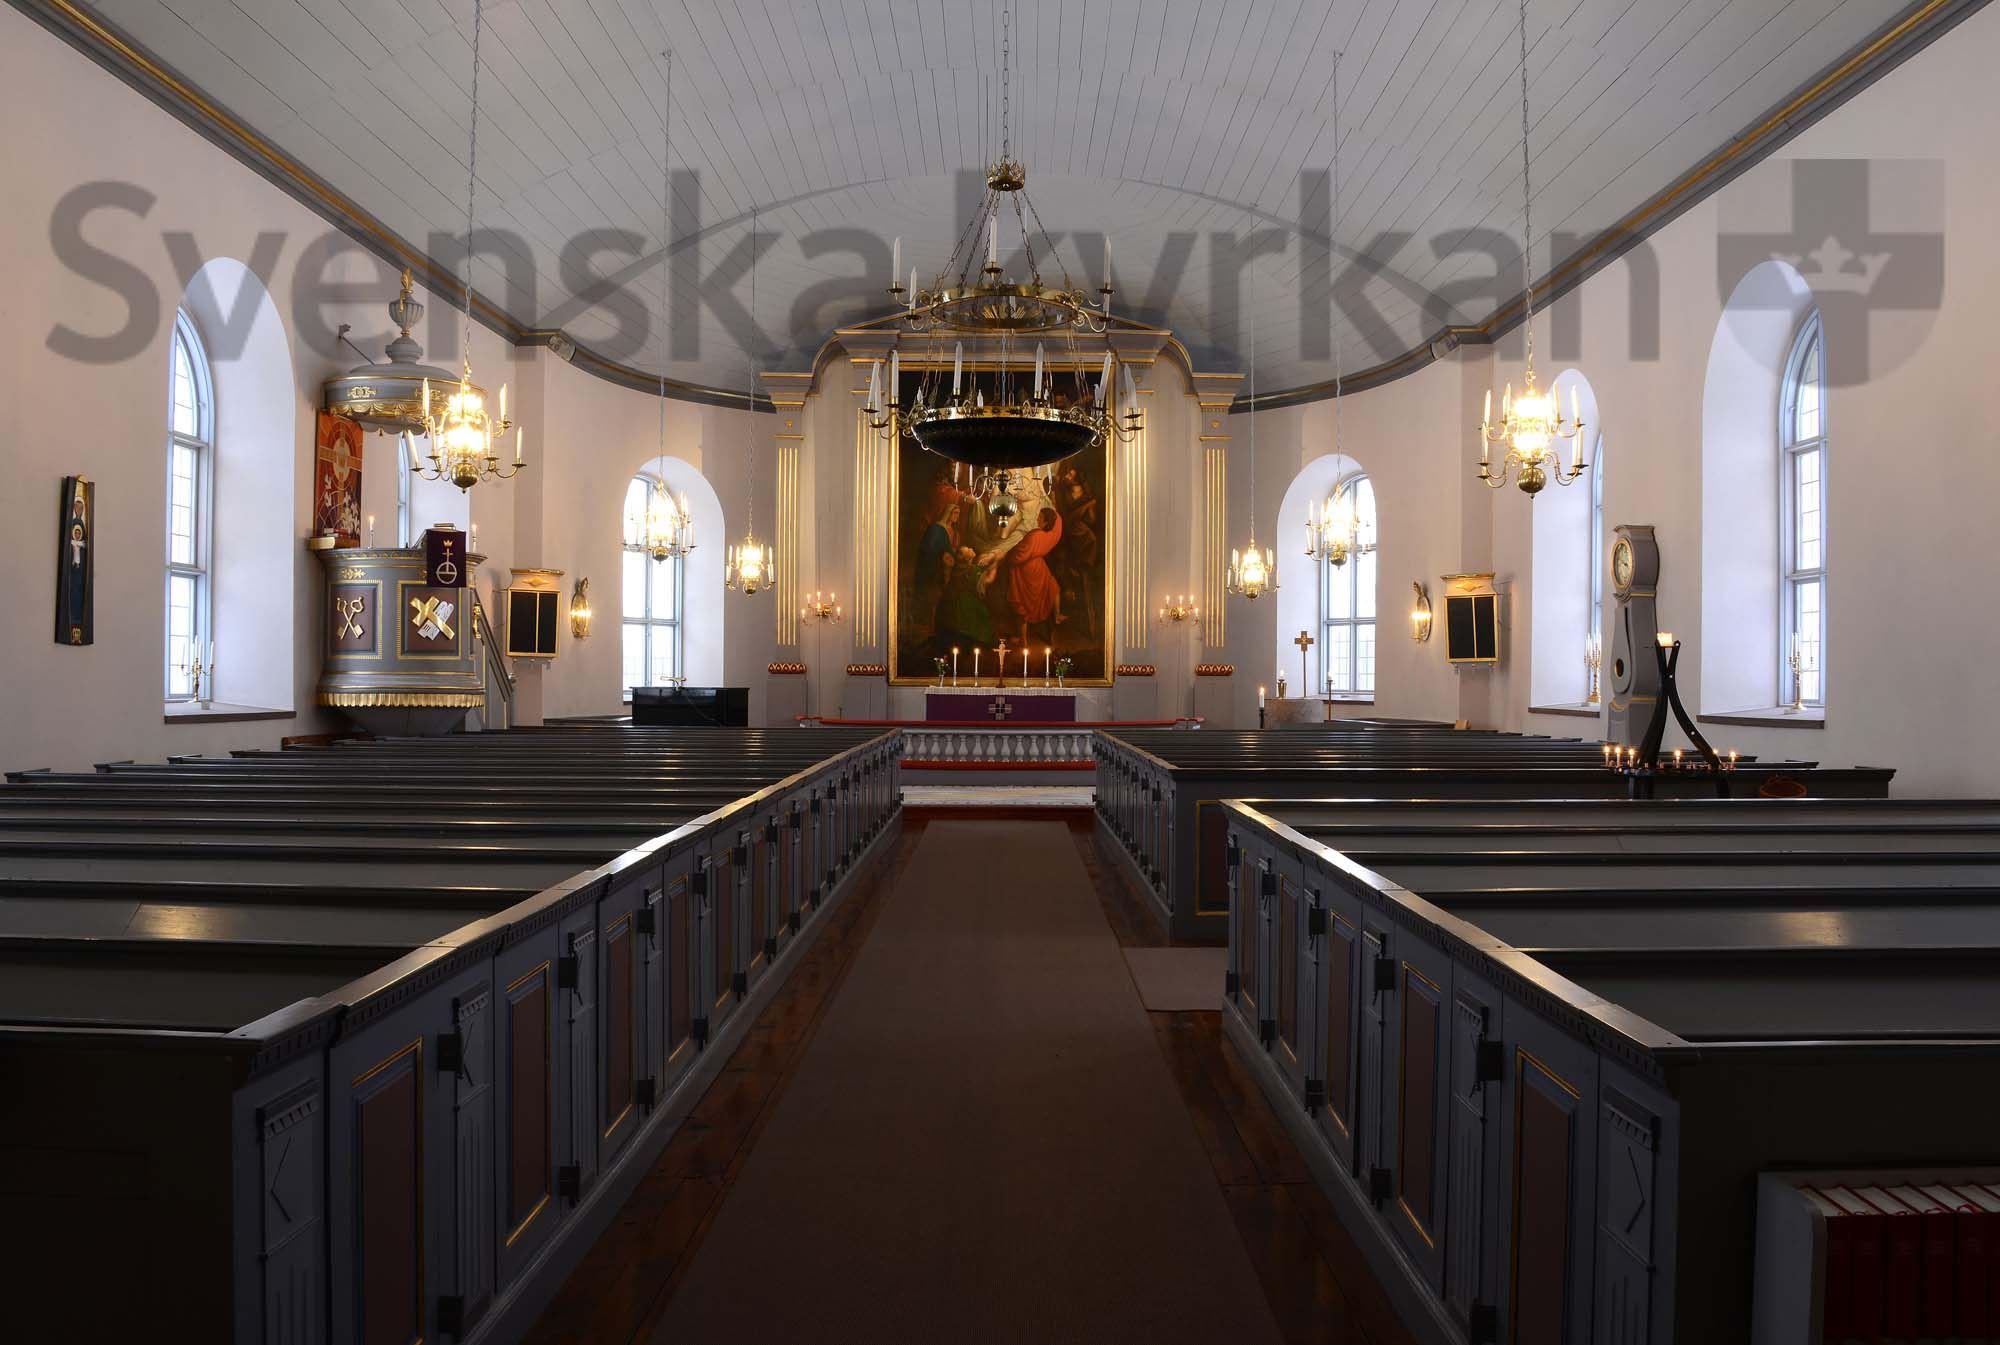 Bengt-Åke Fasth, Vrå kyrka